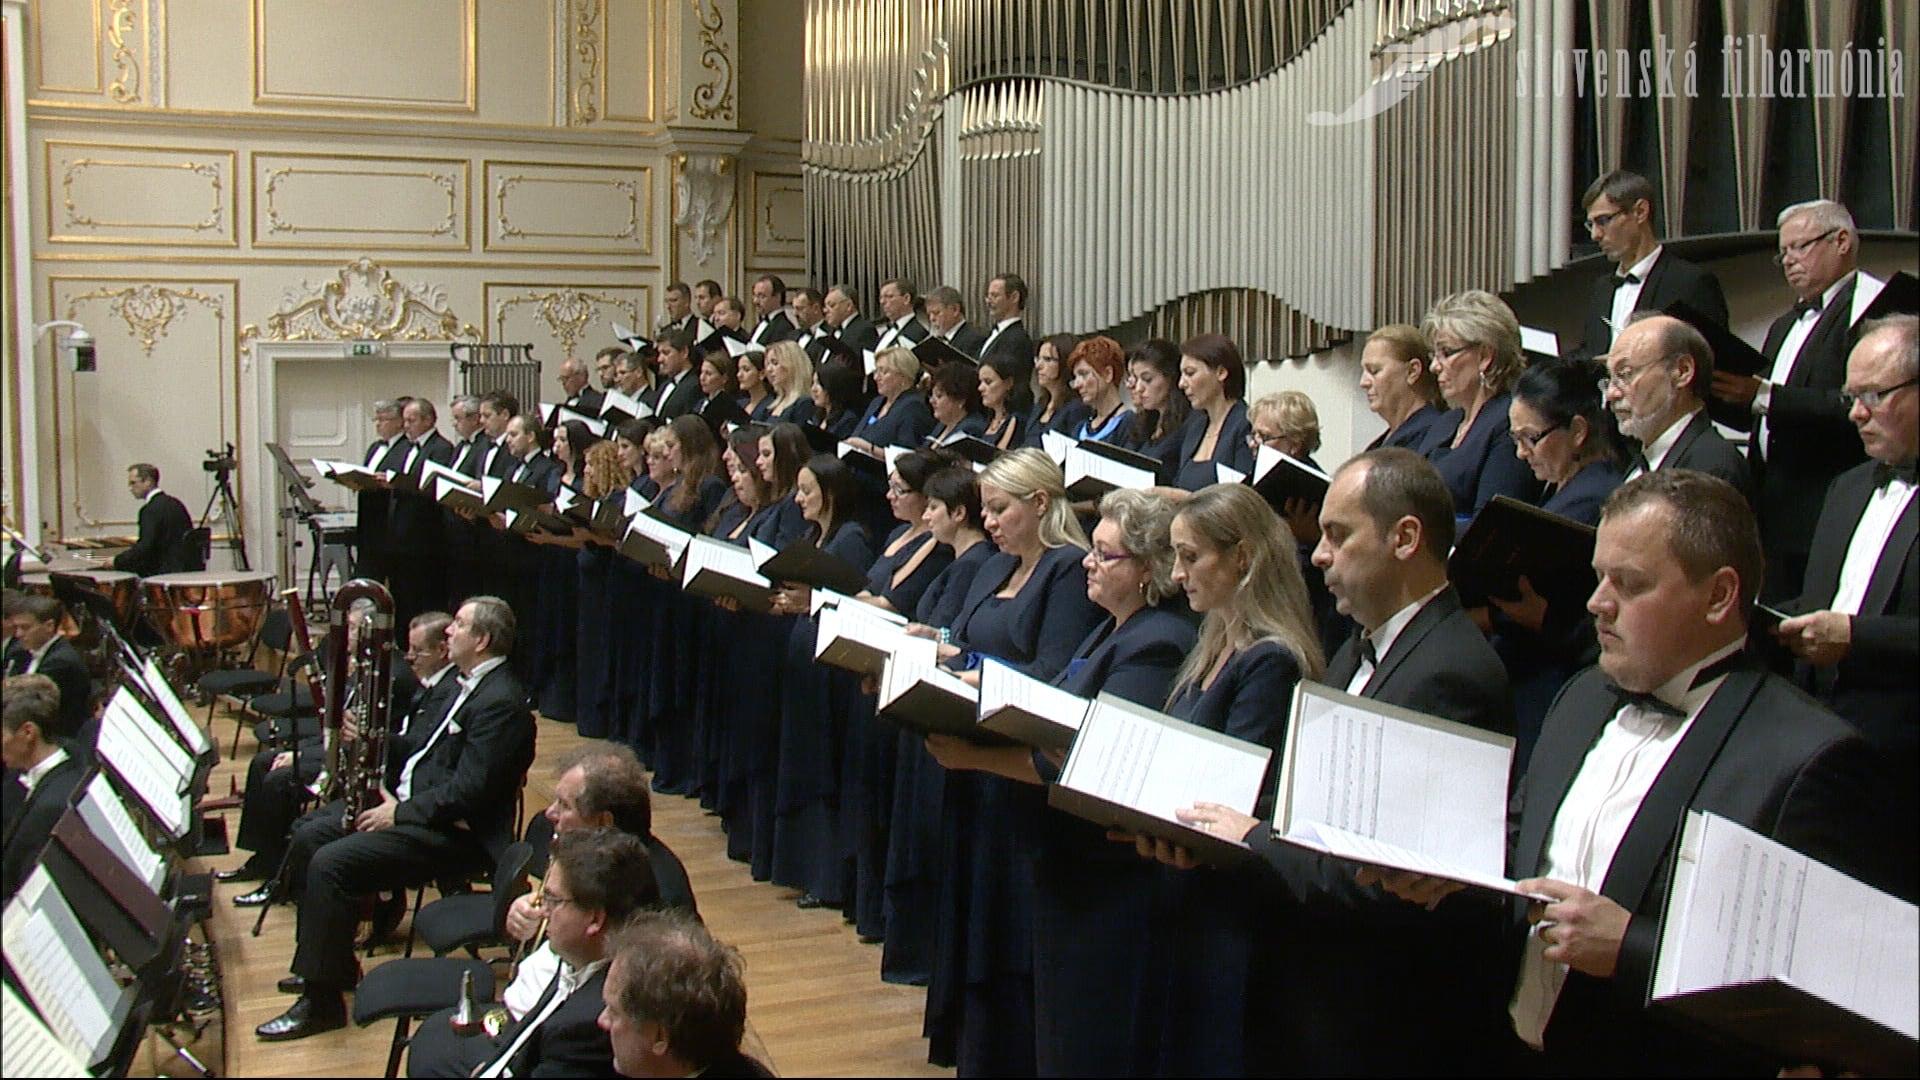 Burlas, Mozart, Mahler